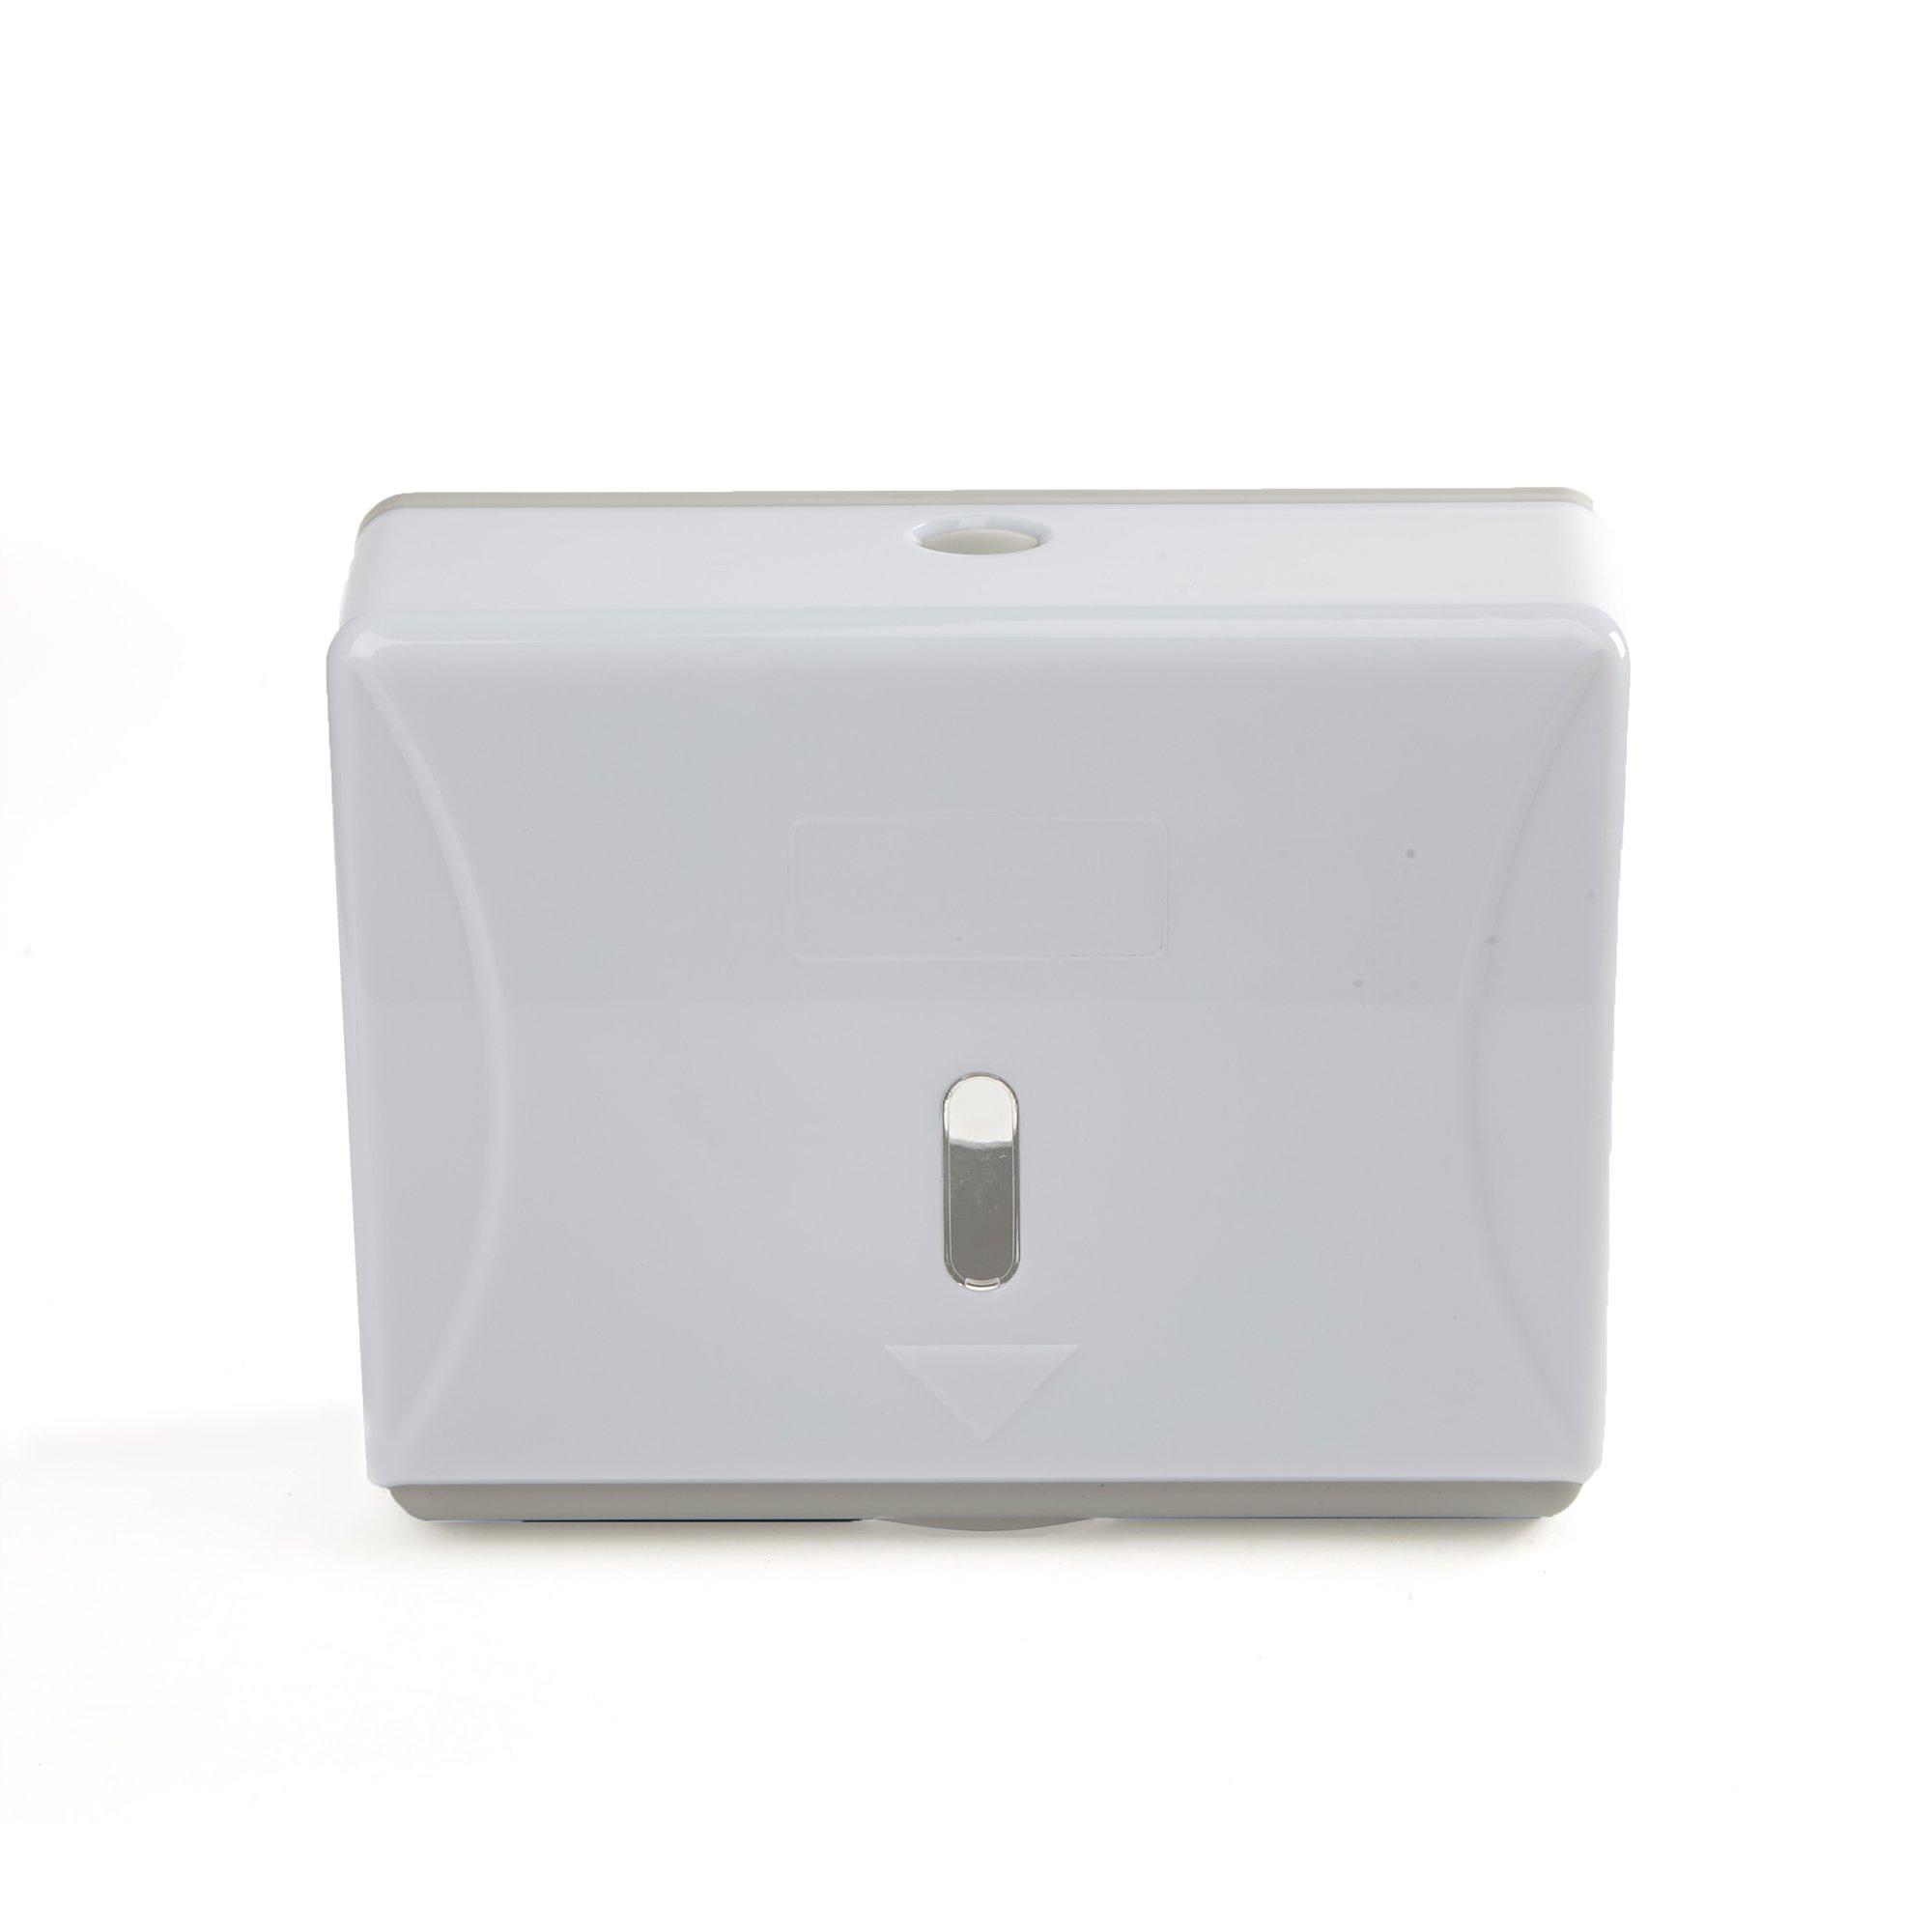 Mind Reader Multi-Fold Paper Towel Dispenser, Paper Towel Holder, 3.75 in. L x 10.5 in. W x 14 in. H